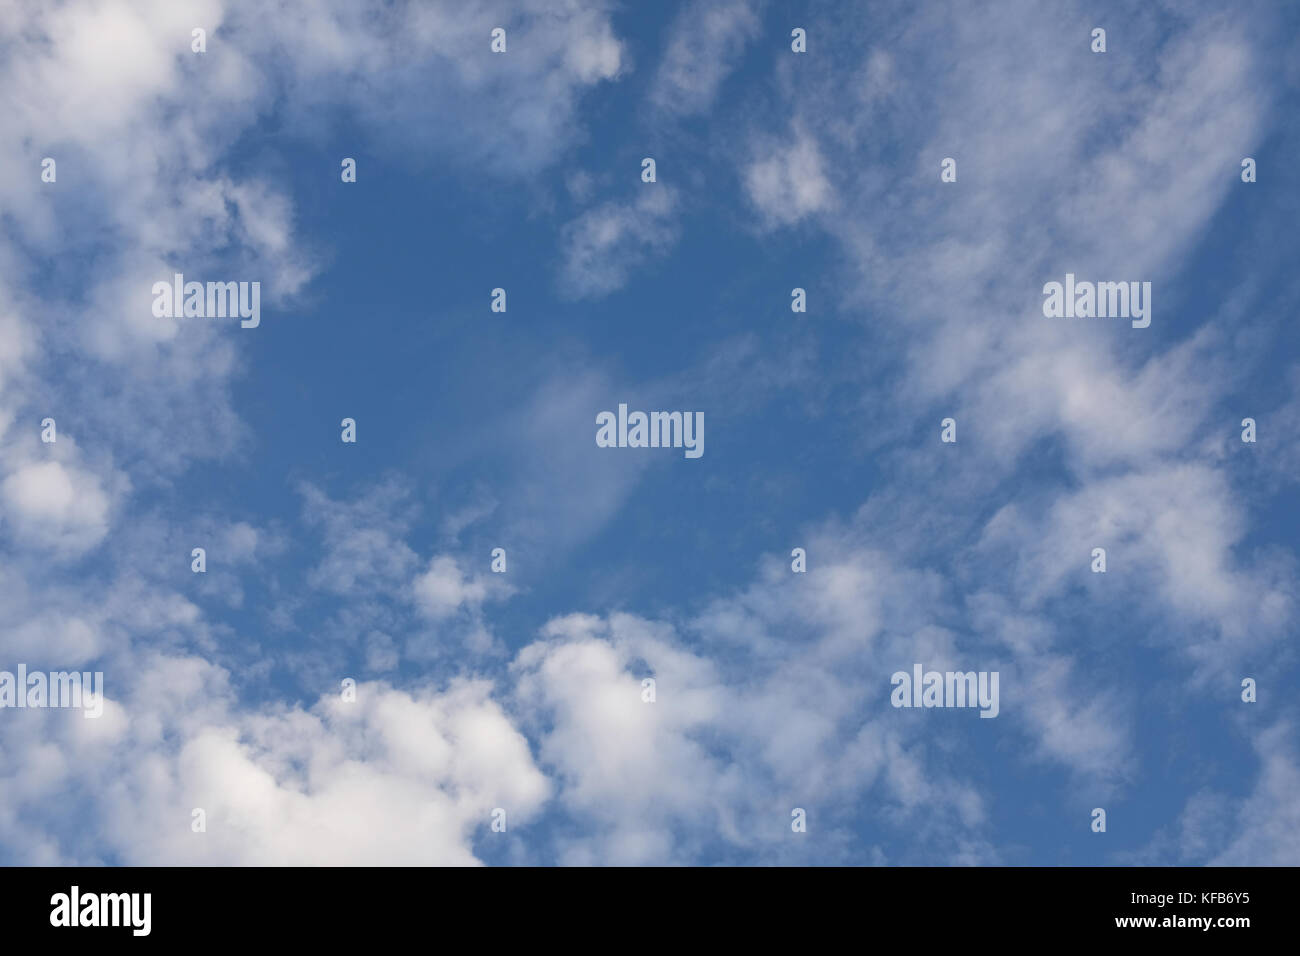 Skyscape - Stock Image